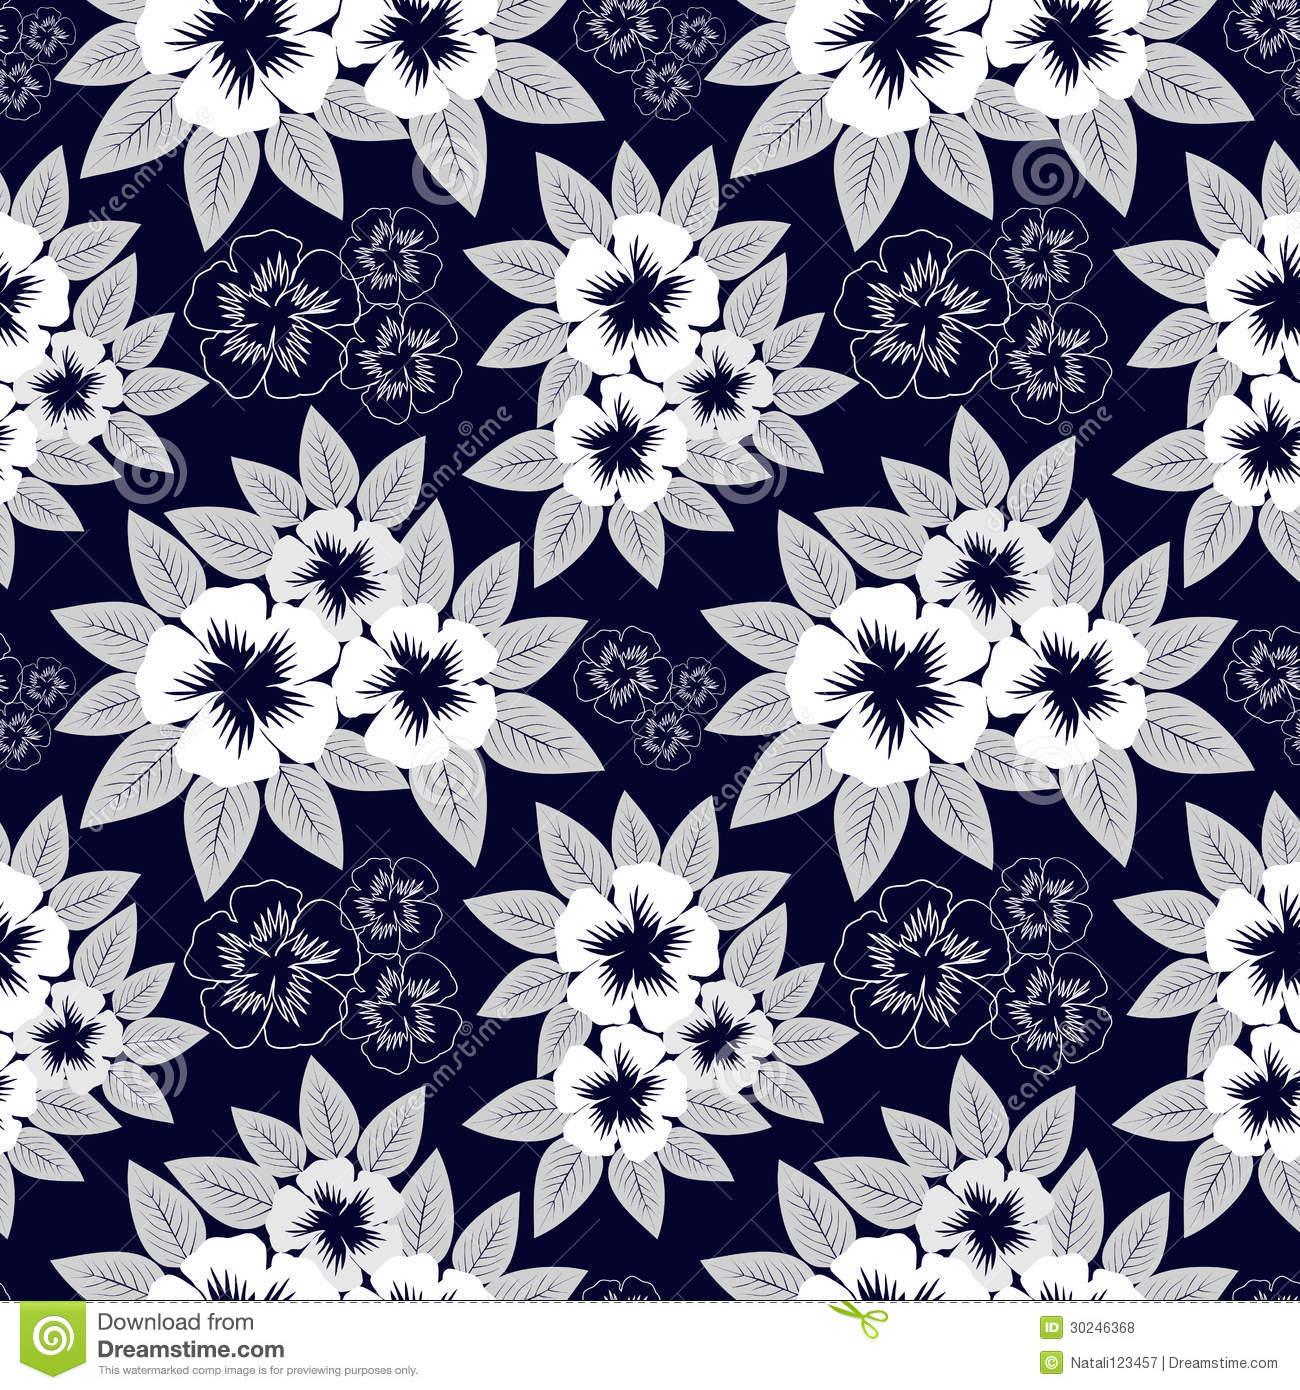 Free Download Navy Pattern Wallpaper Seamless Navy Blue Pattern